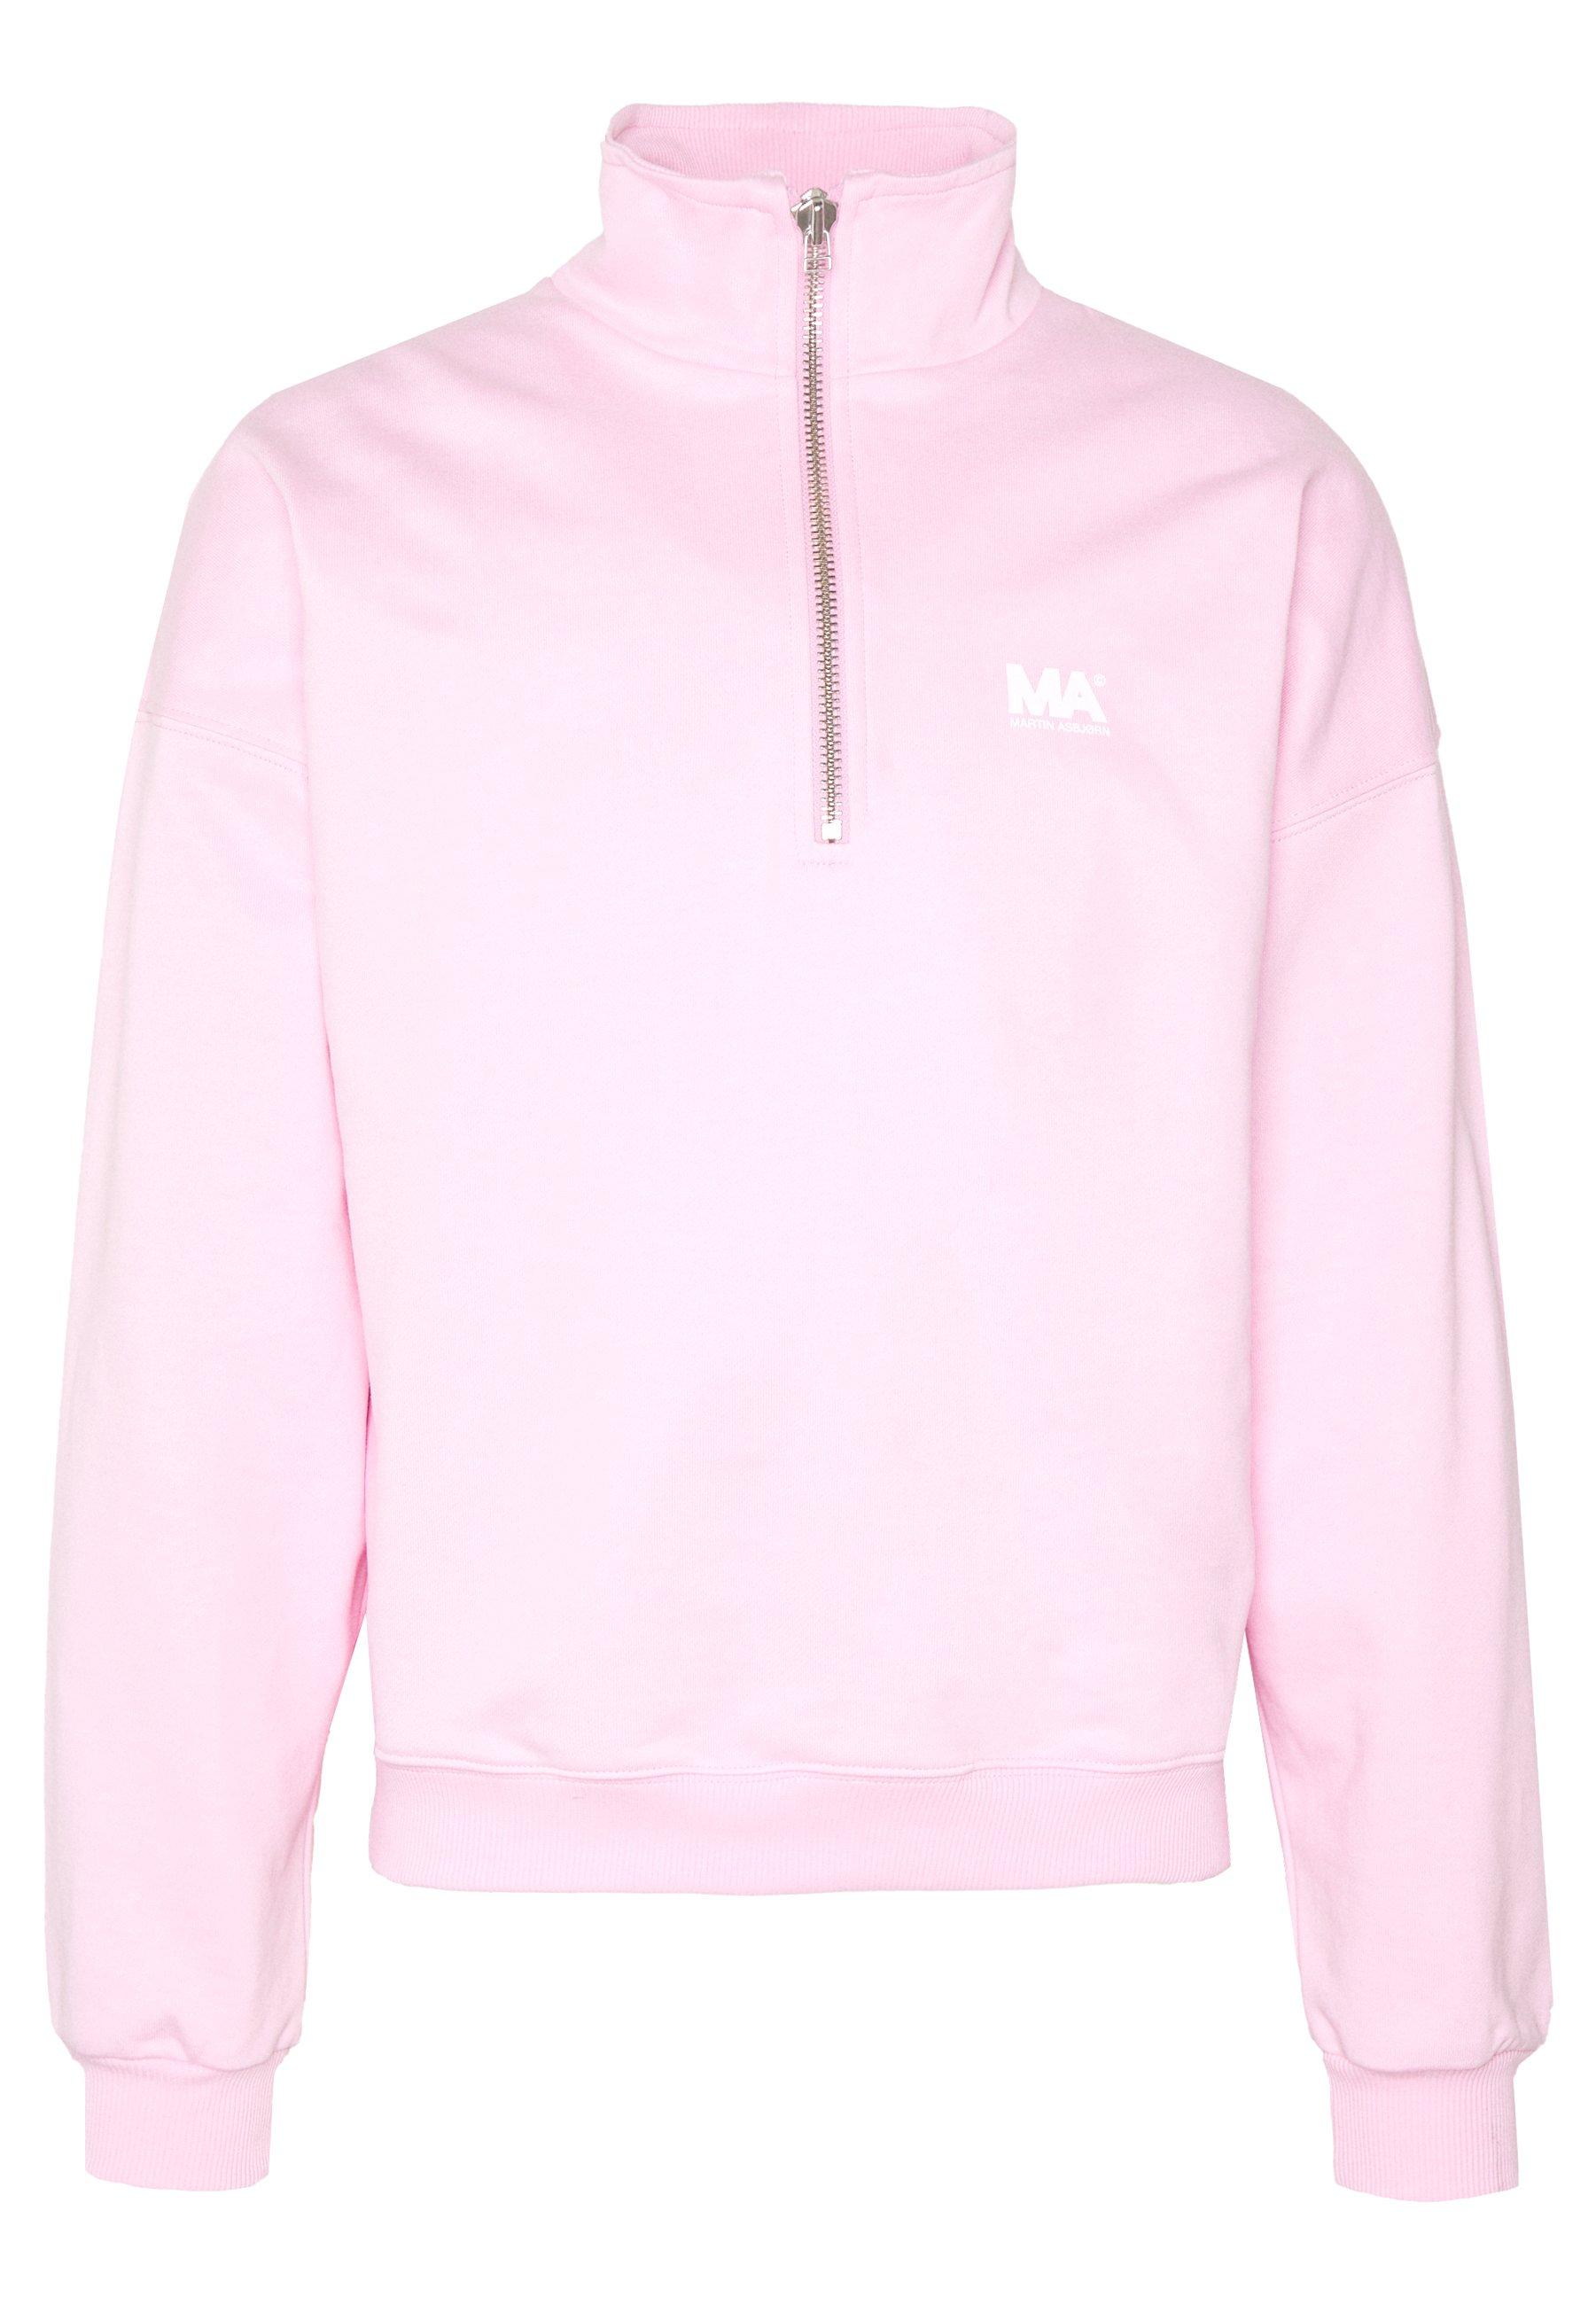 Martin Asbjørn JEREMY TURTLENECK - Sweatshirt - pink